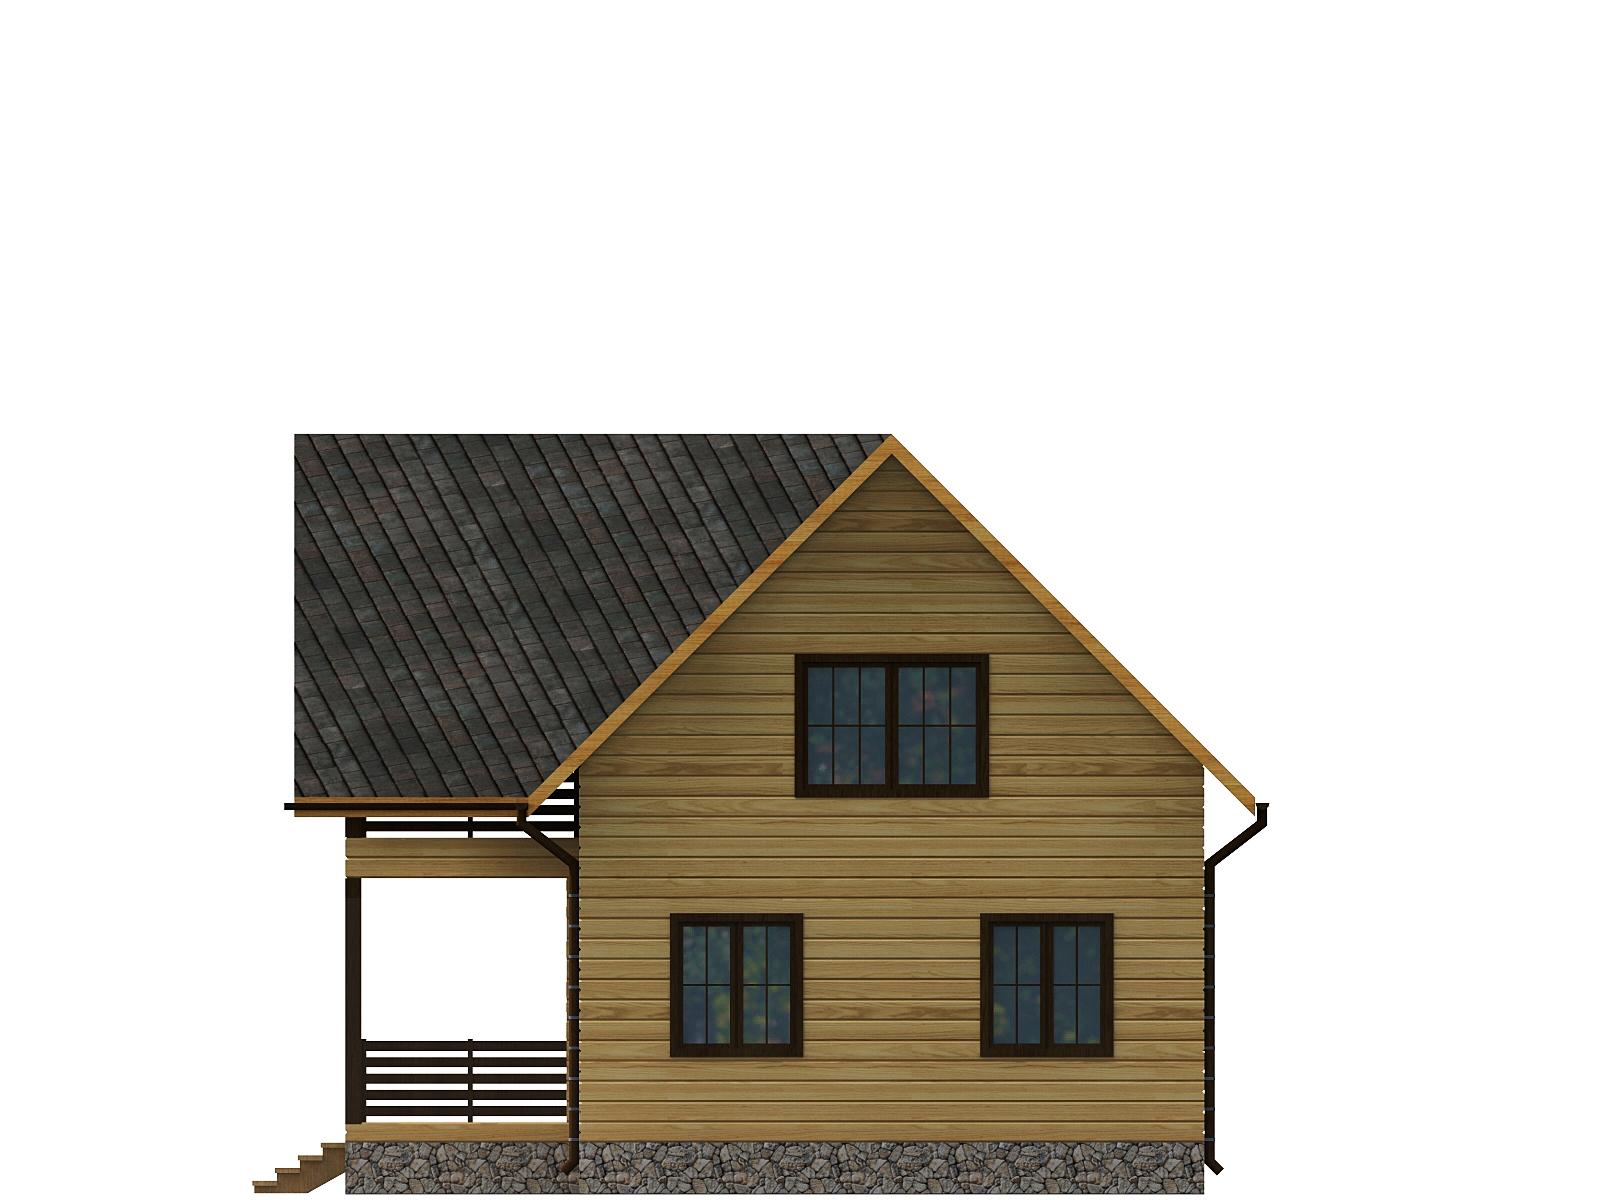 dom-iz-brusa-6x12-1.5-etazha-s-mansardoi-razrez3